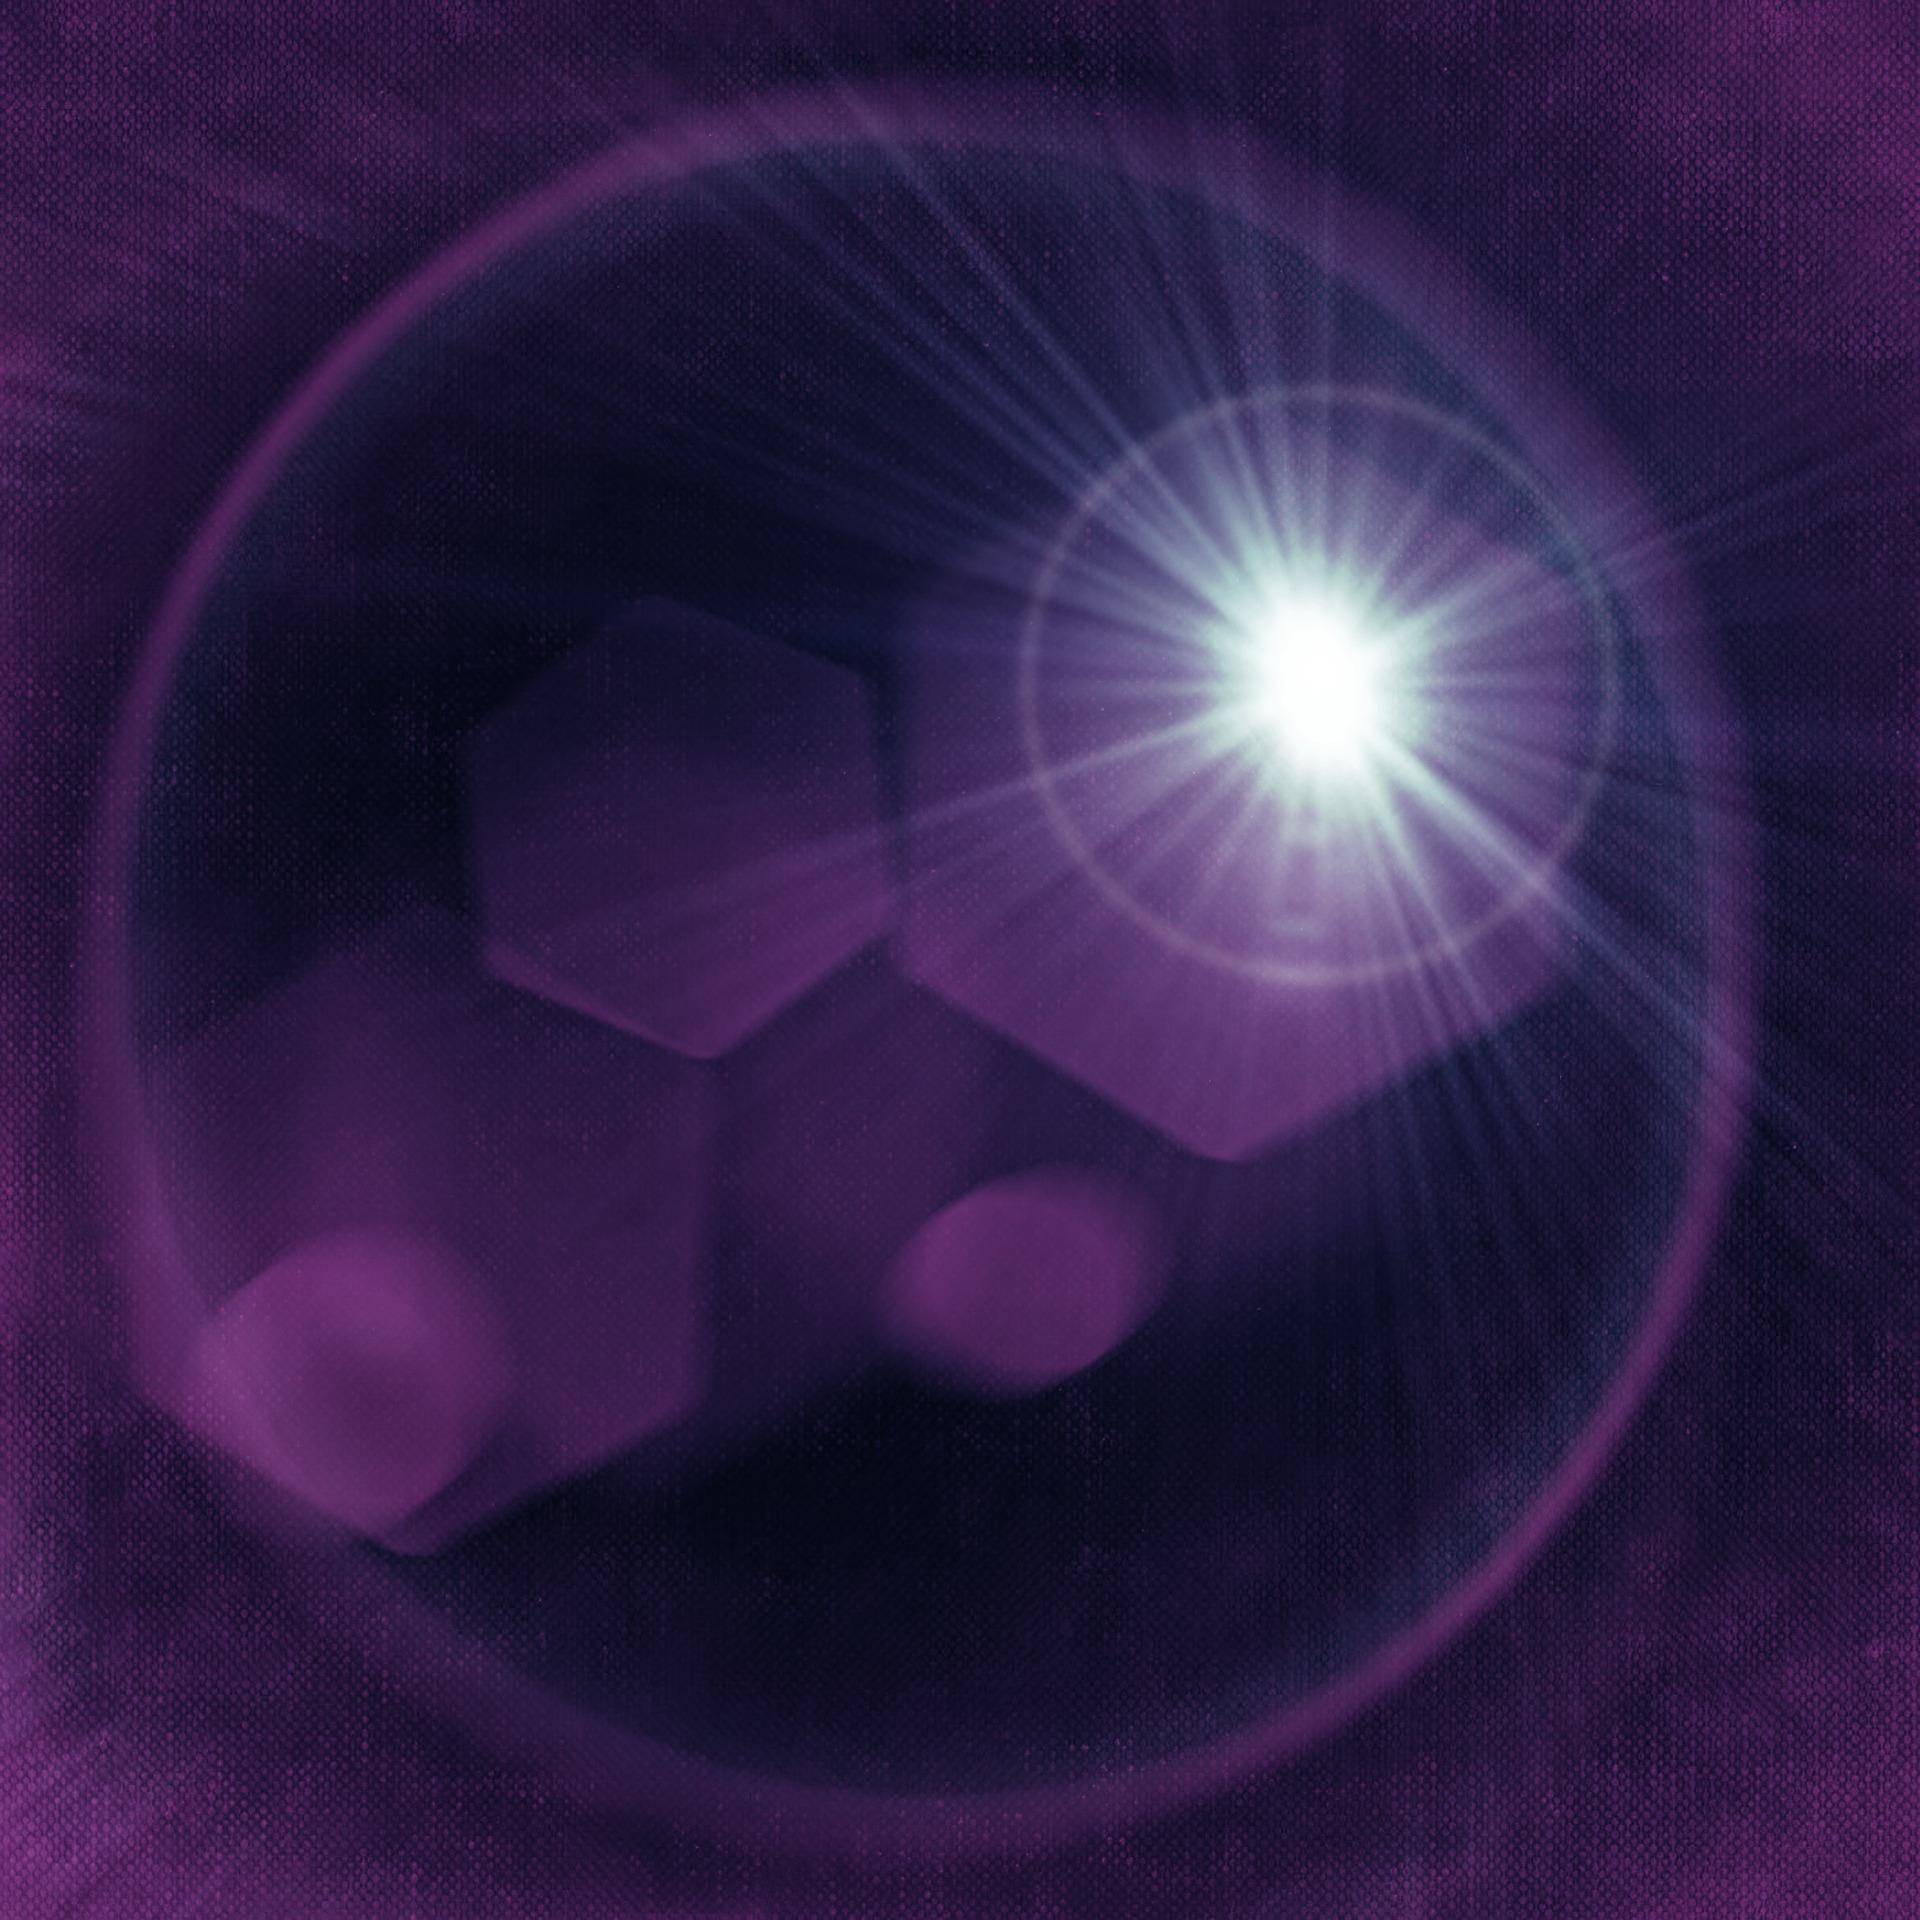 deep purple background